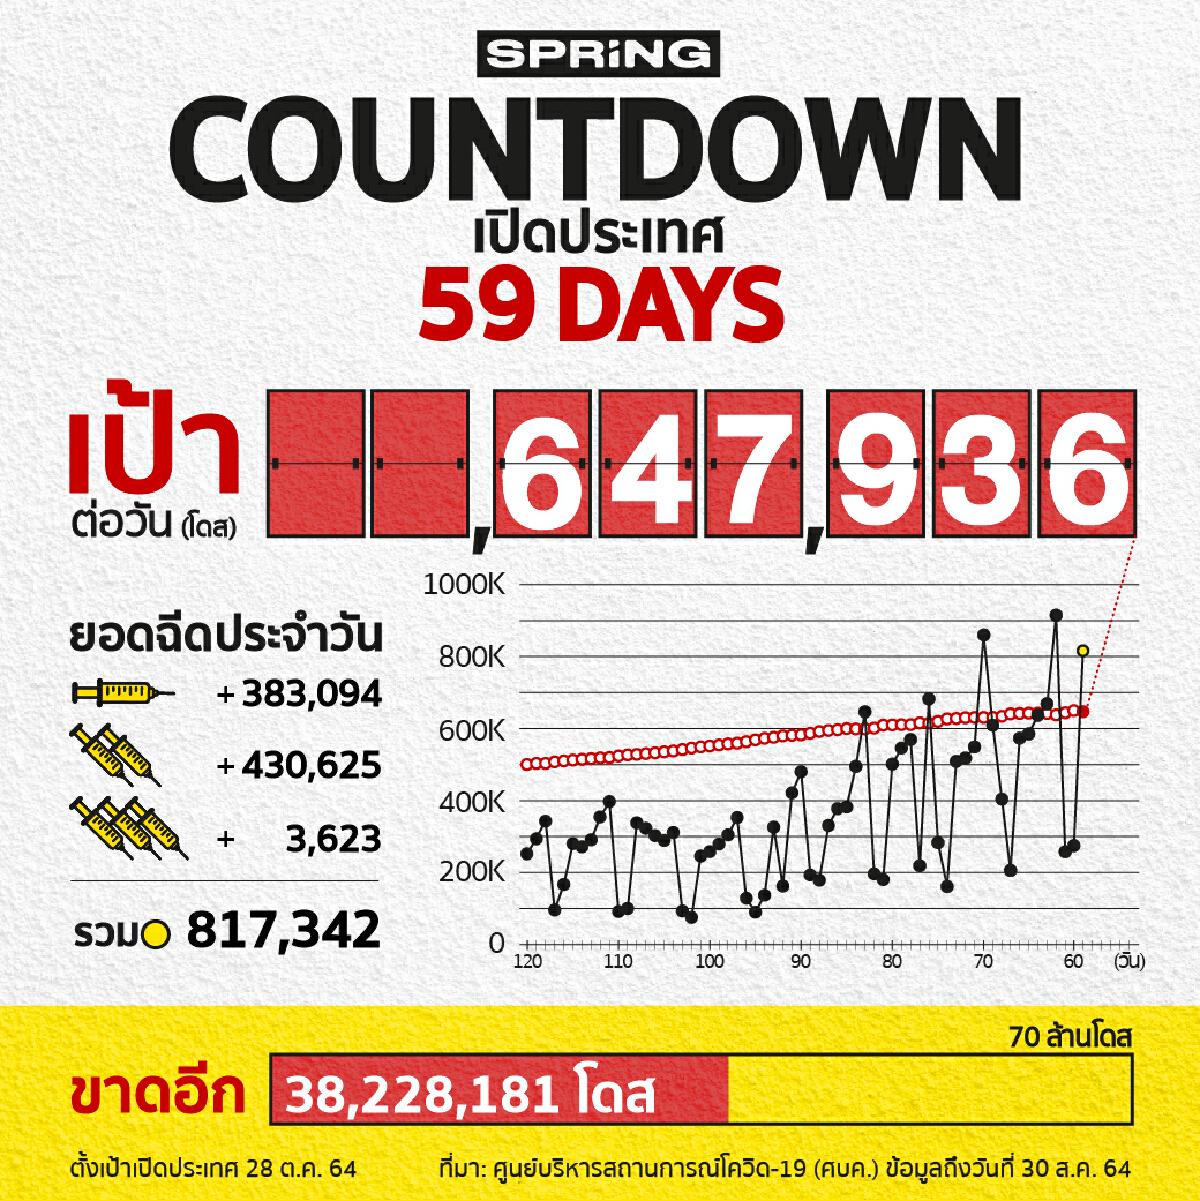 COUNTDOWN! เปิดประเทศใน 59 วัน ฉีดวัคซีนโควิด 817,342 โดส